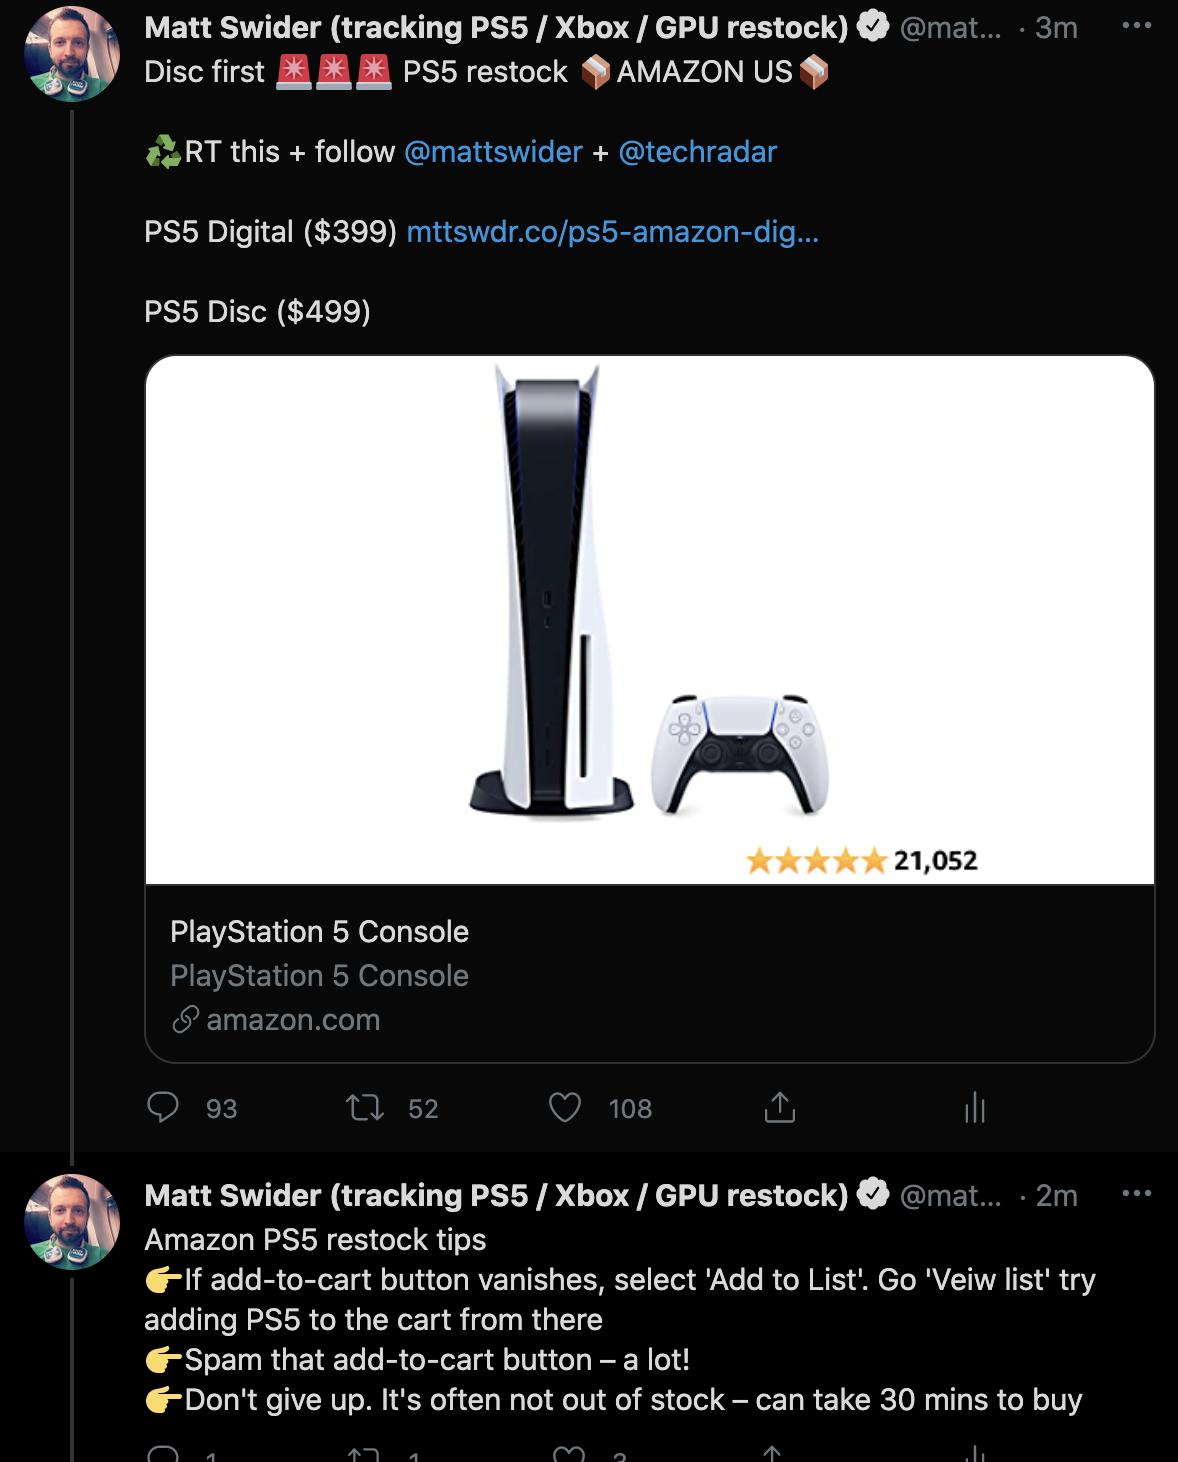 PS5 restock Twitter tracker alert for Amazon